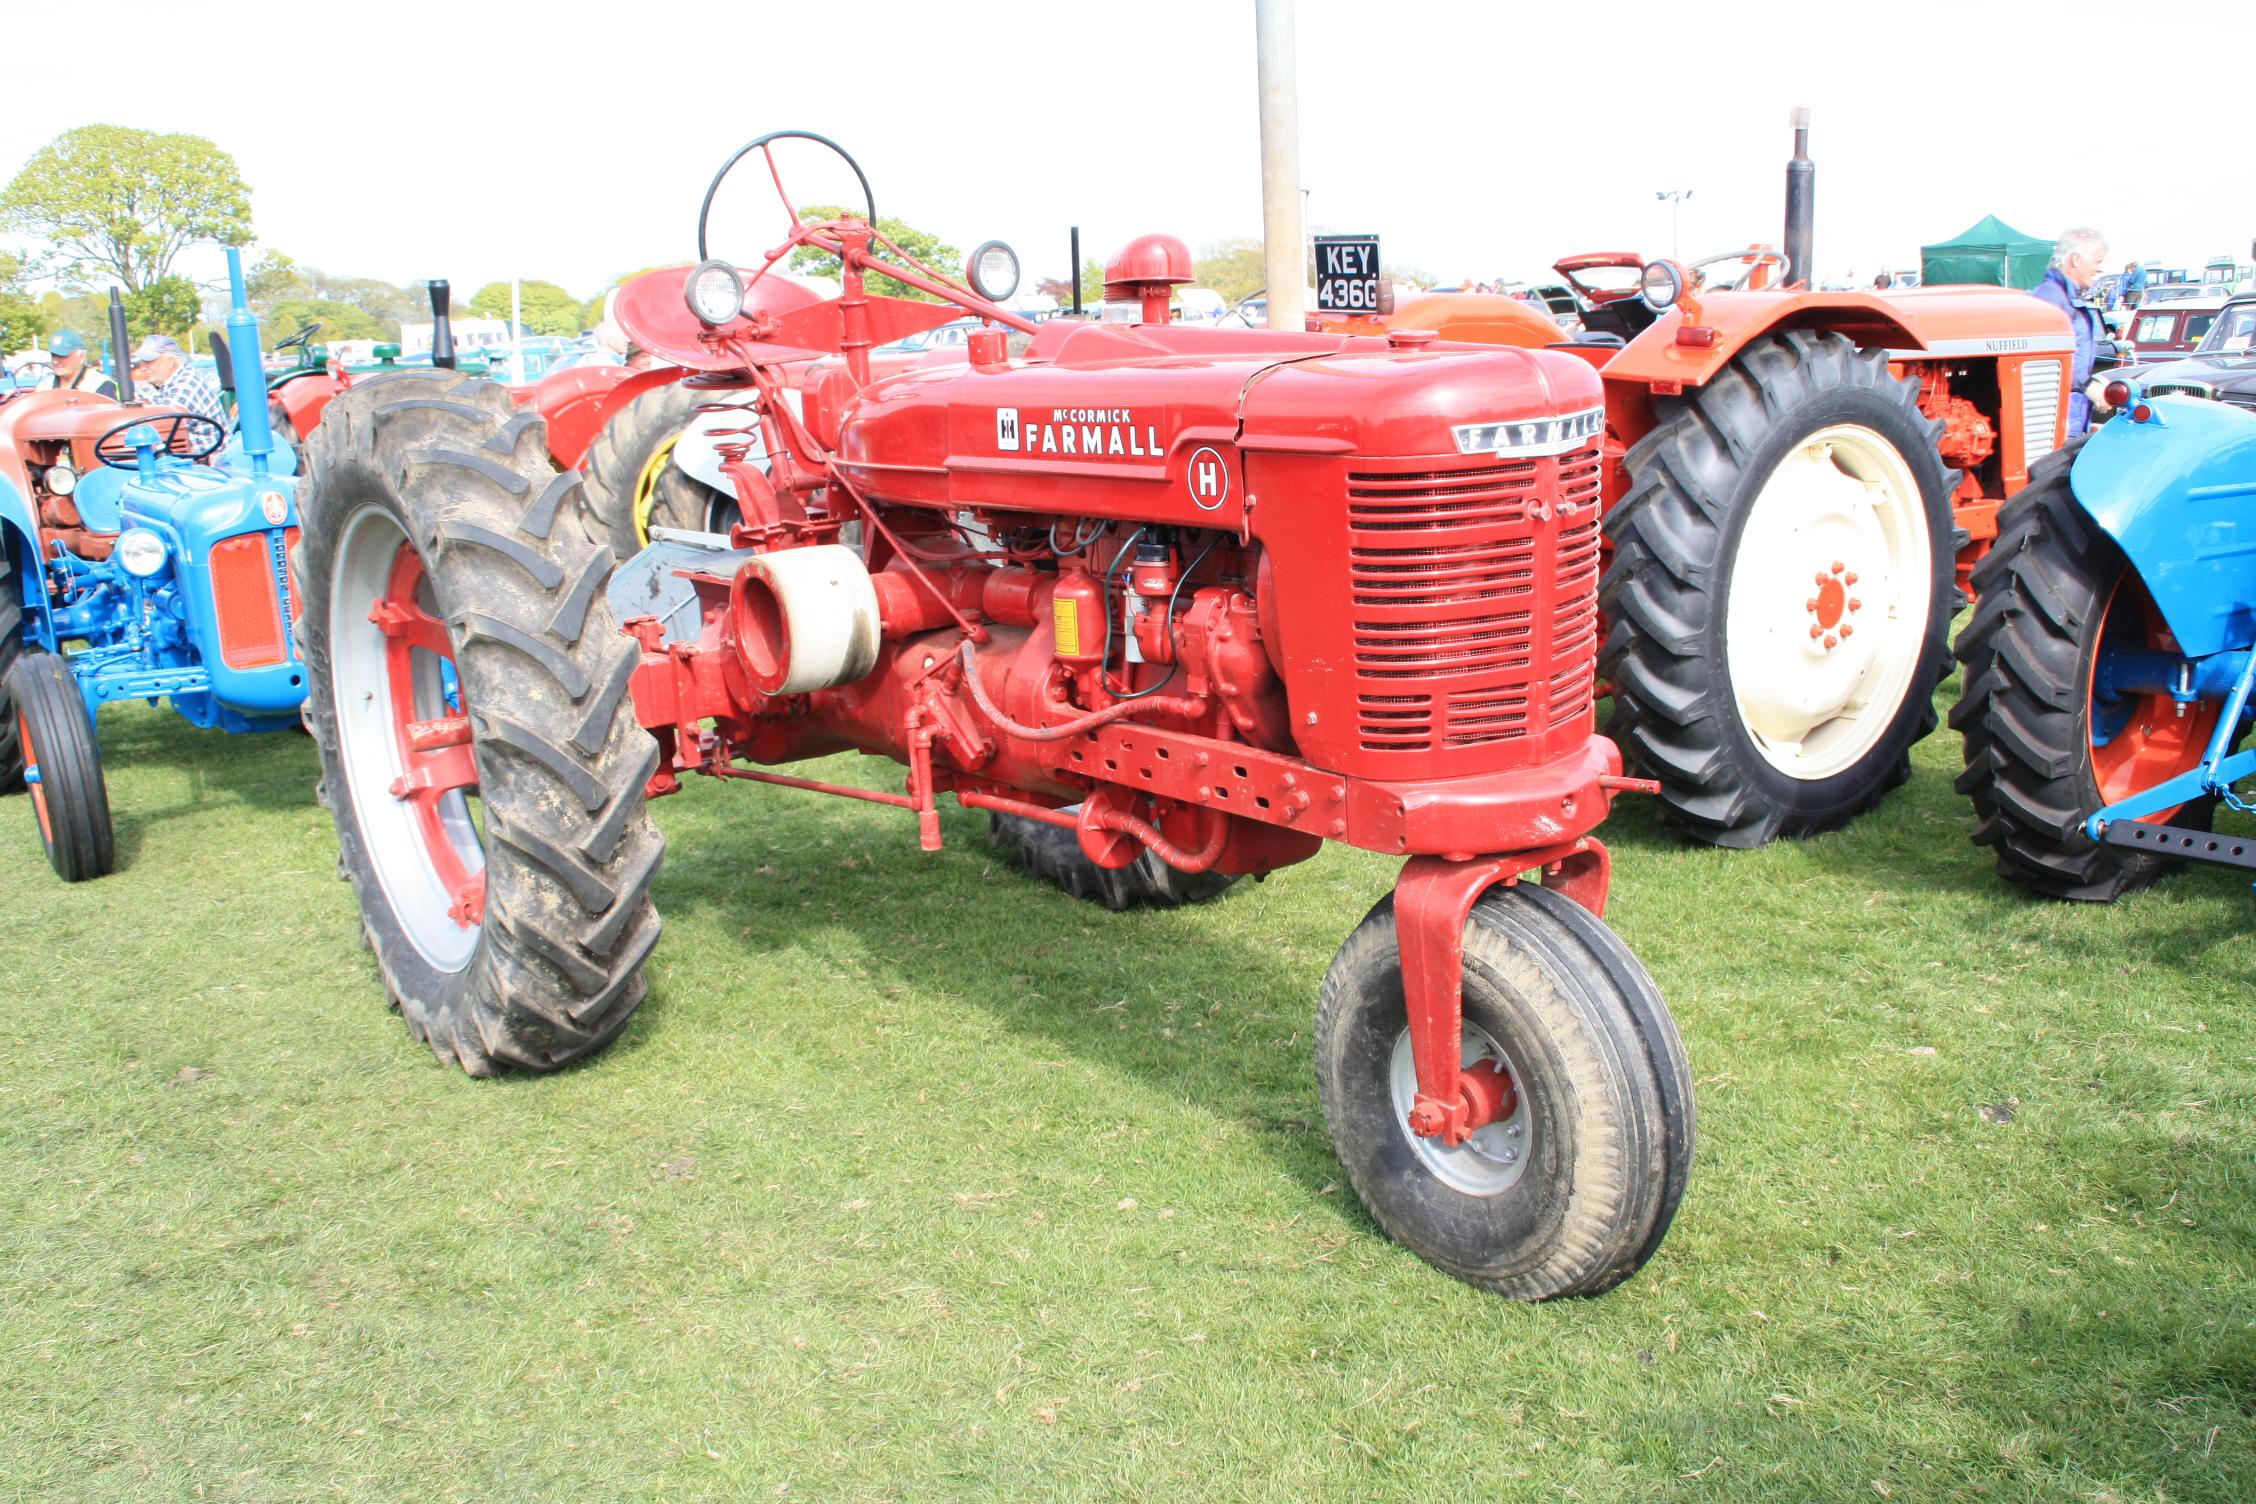 International Farmall M Tractor Parts Wiring Diagram H Construction Plant Wiki Fandom Powered By Wikia Rh Tractors Com